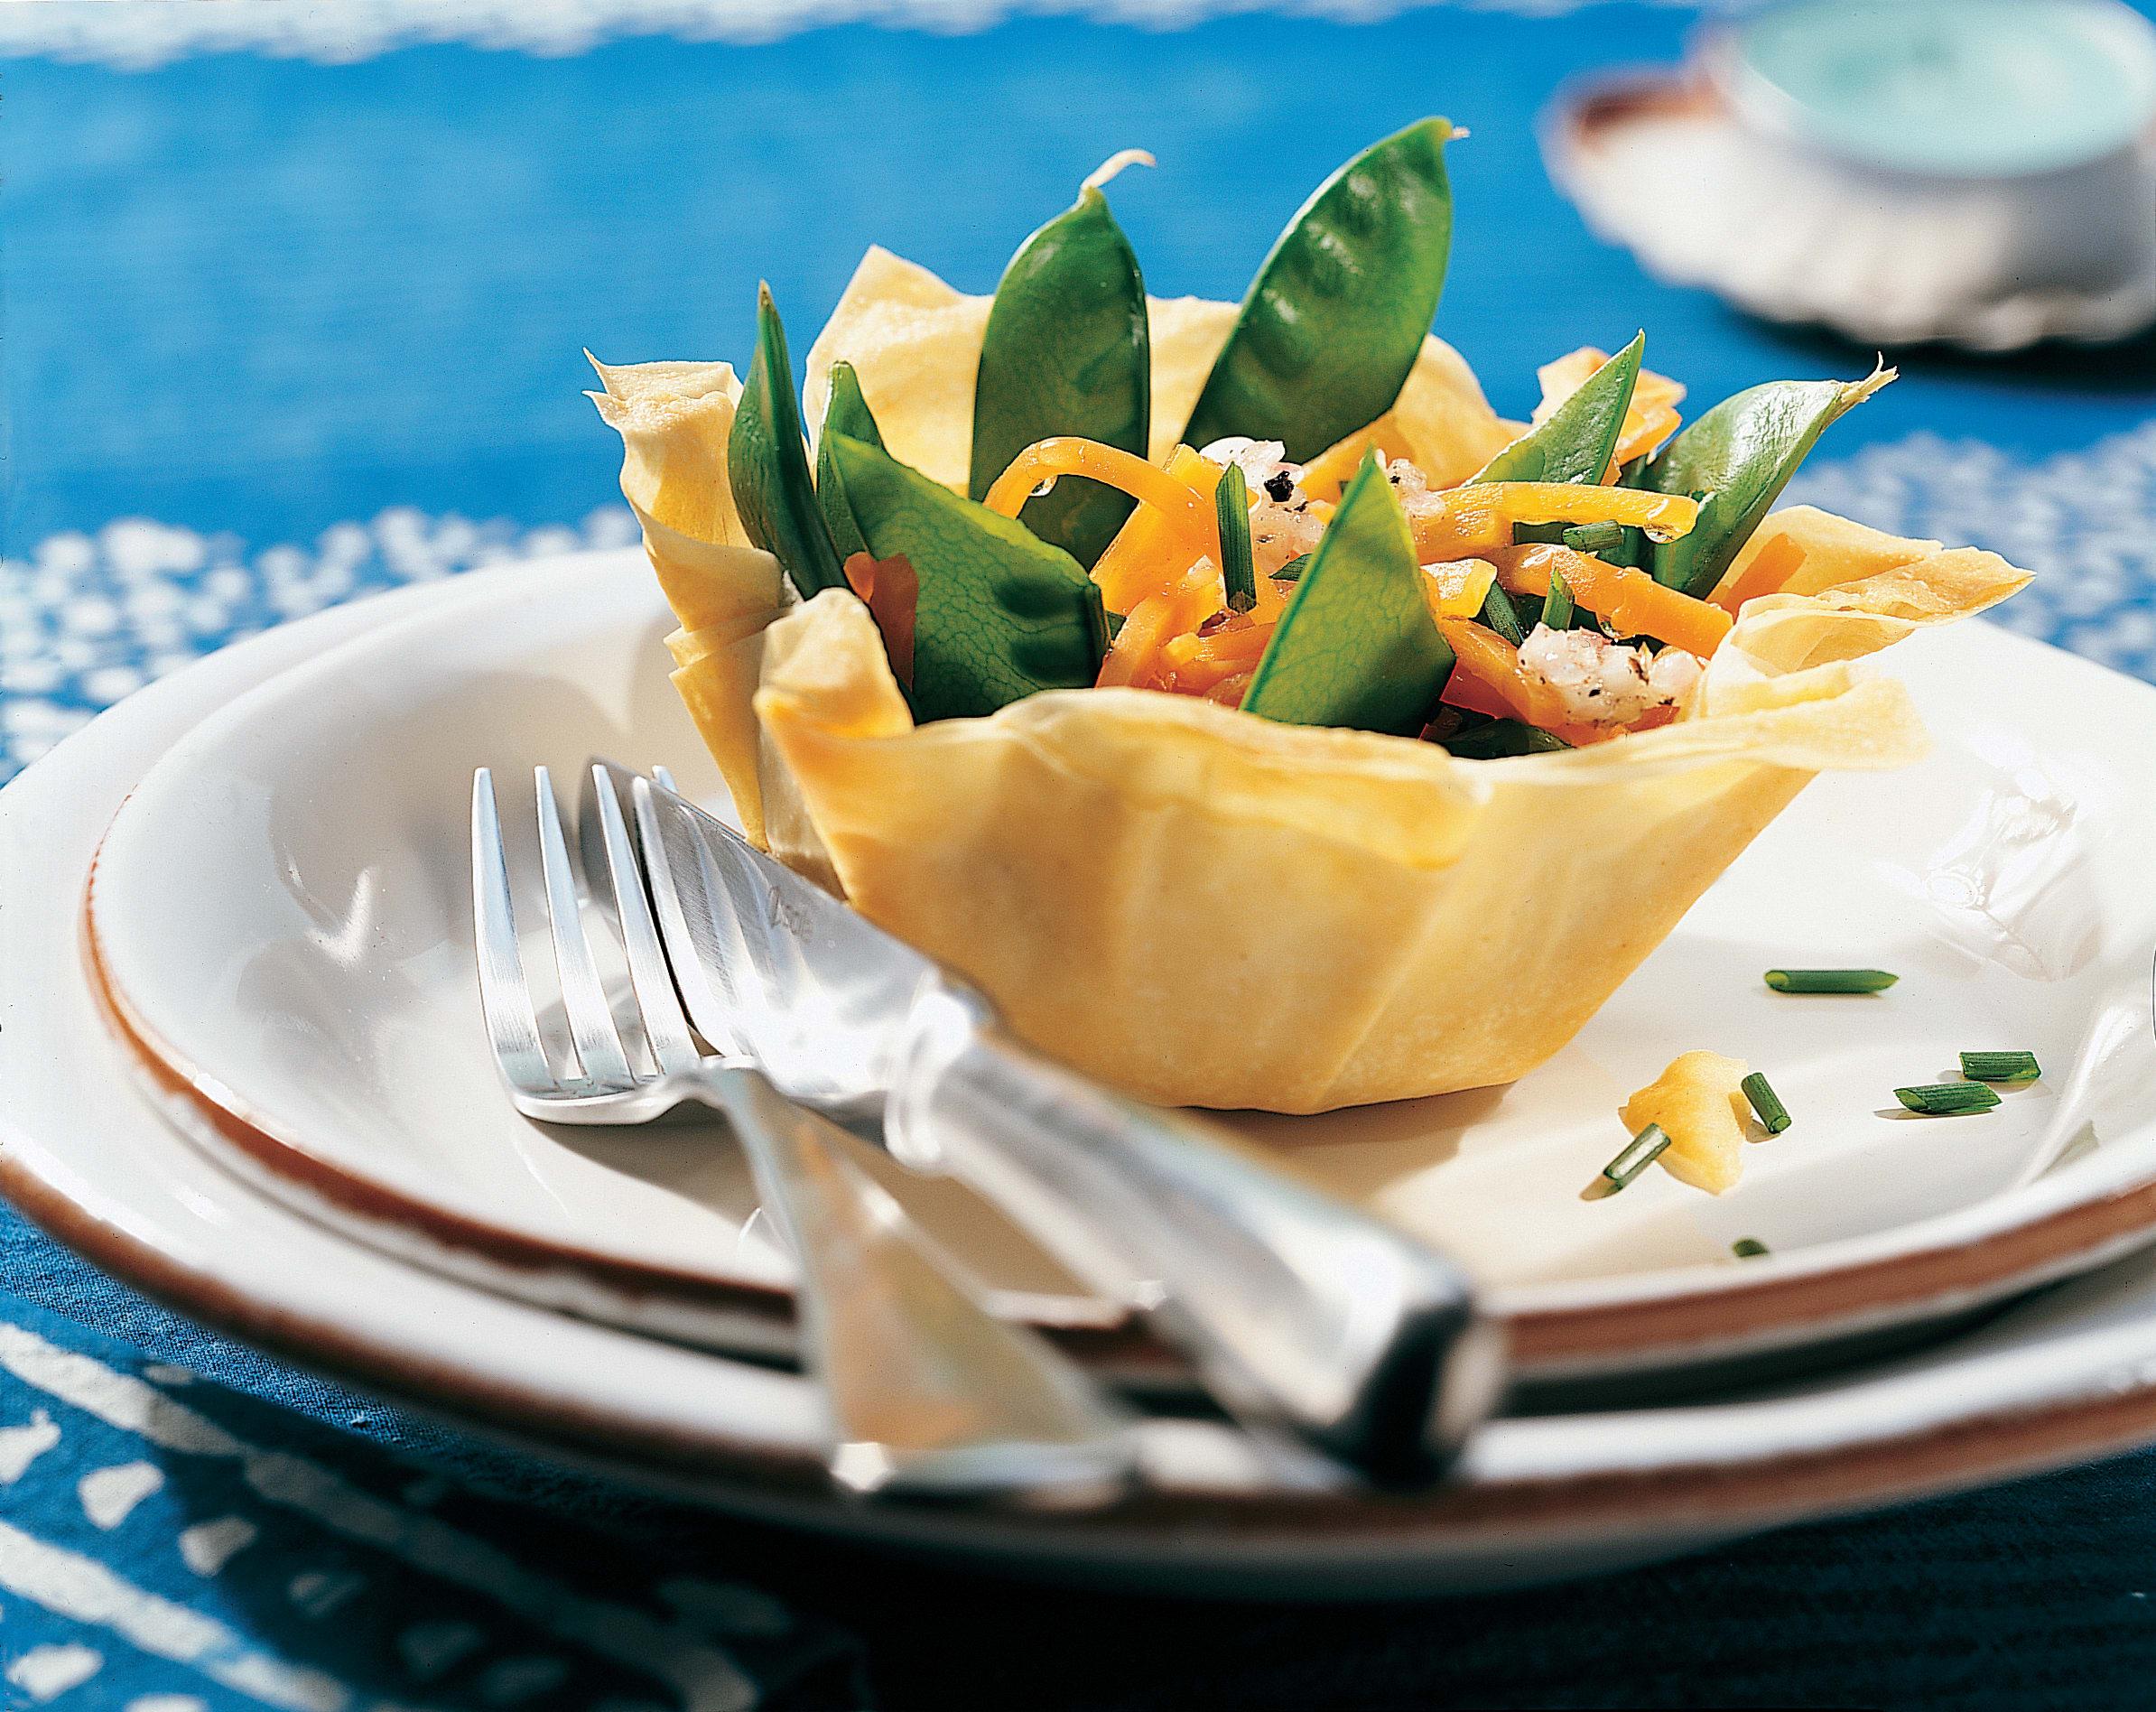 Corbeilles de pois mange-tout en salade